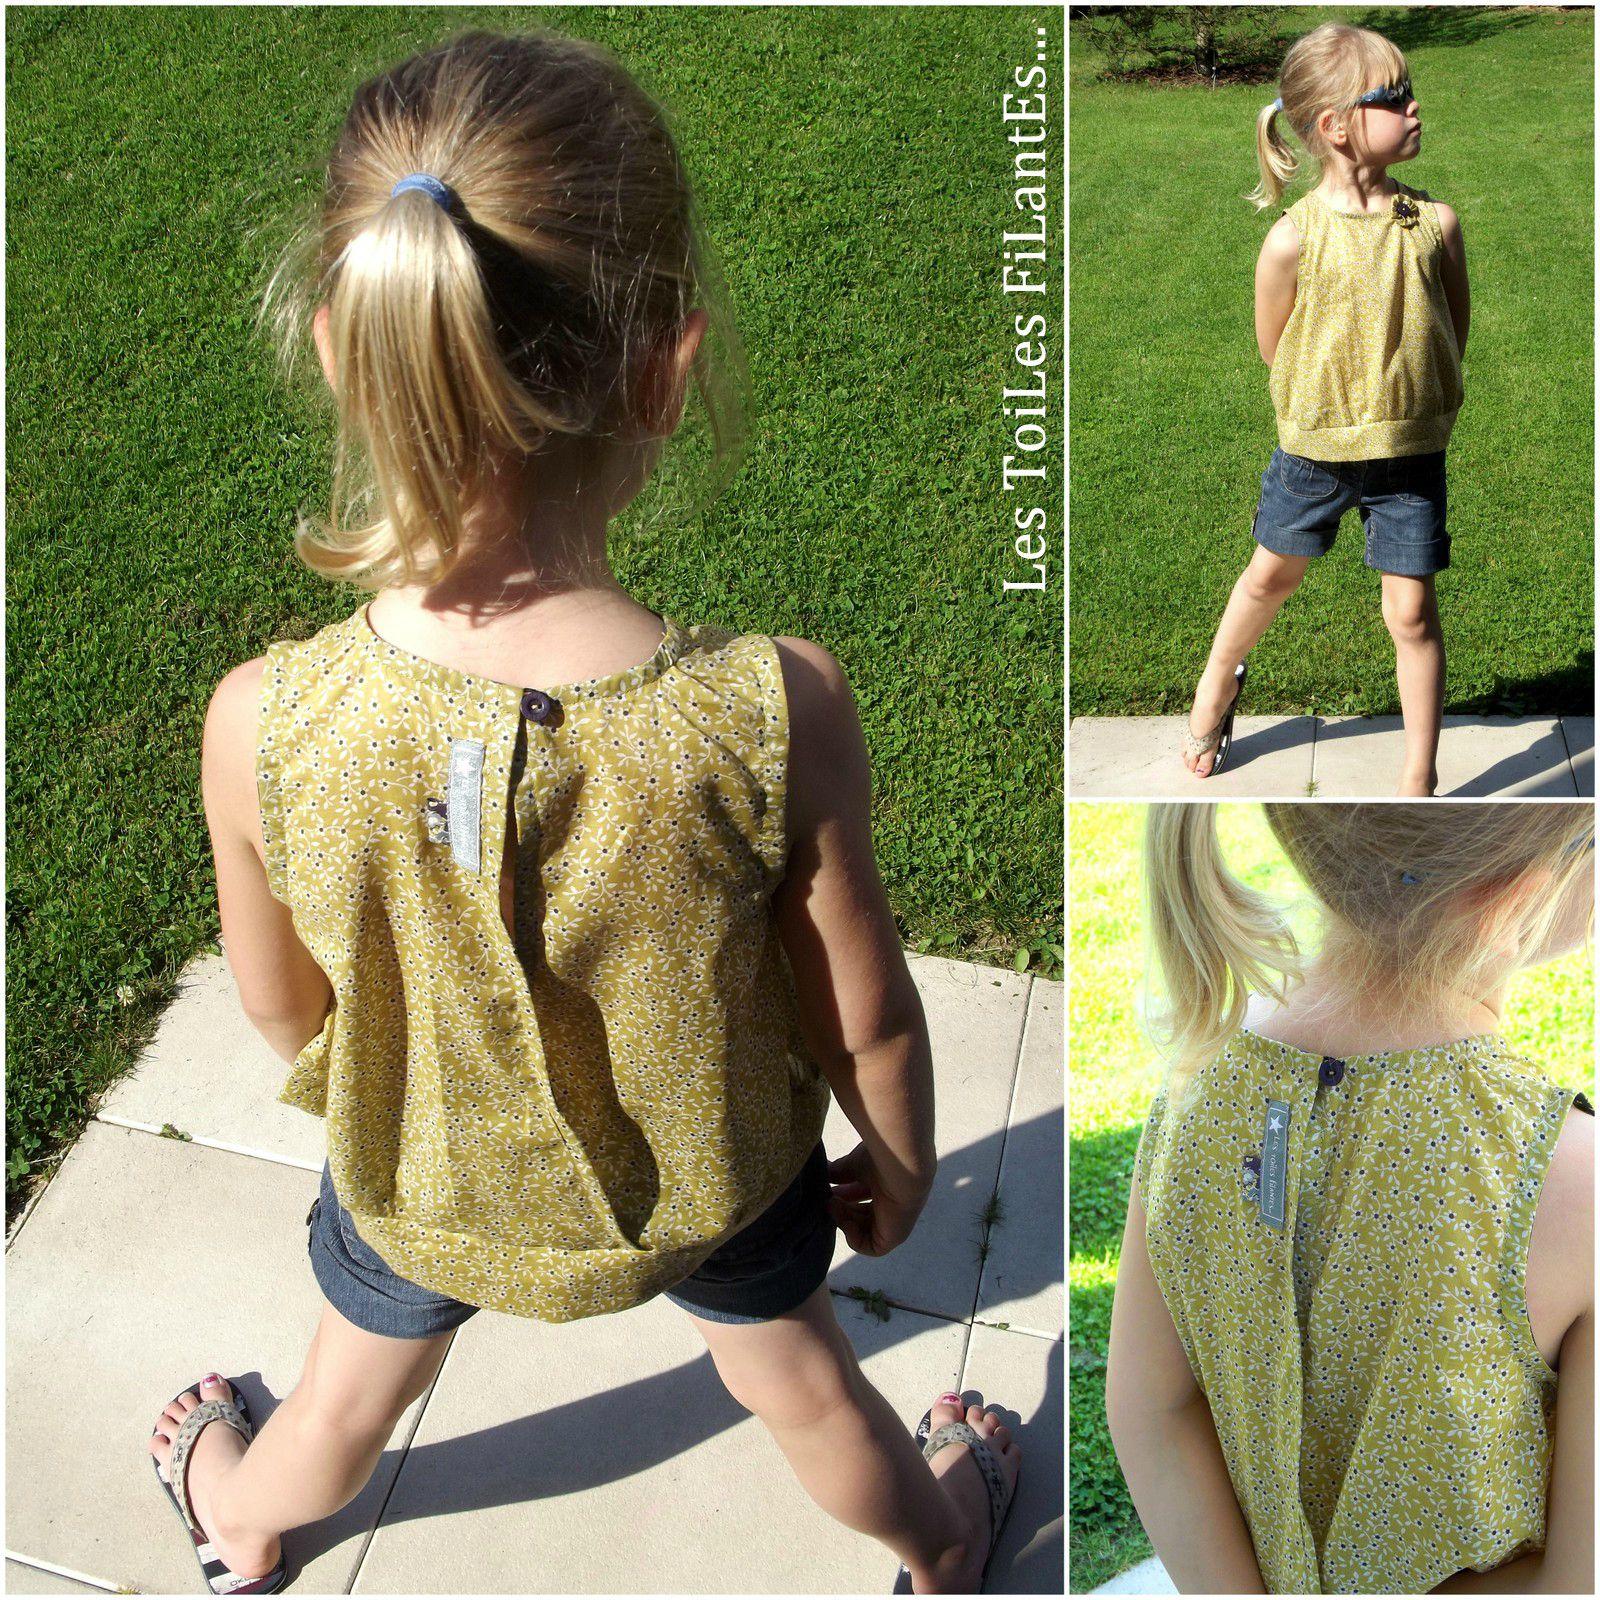 1-Shorts en jean et blouses assorties